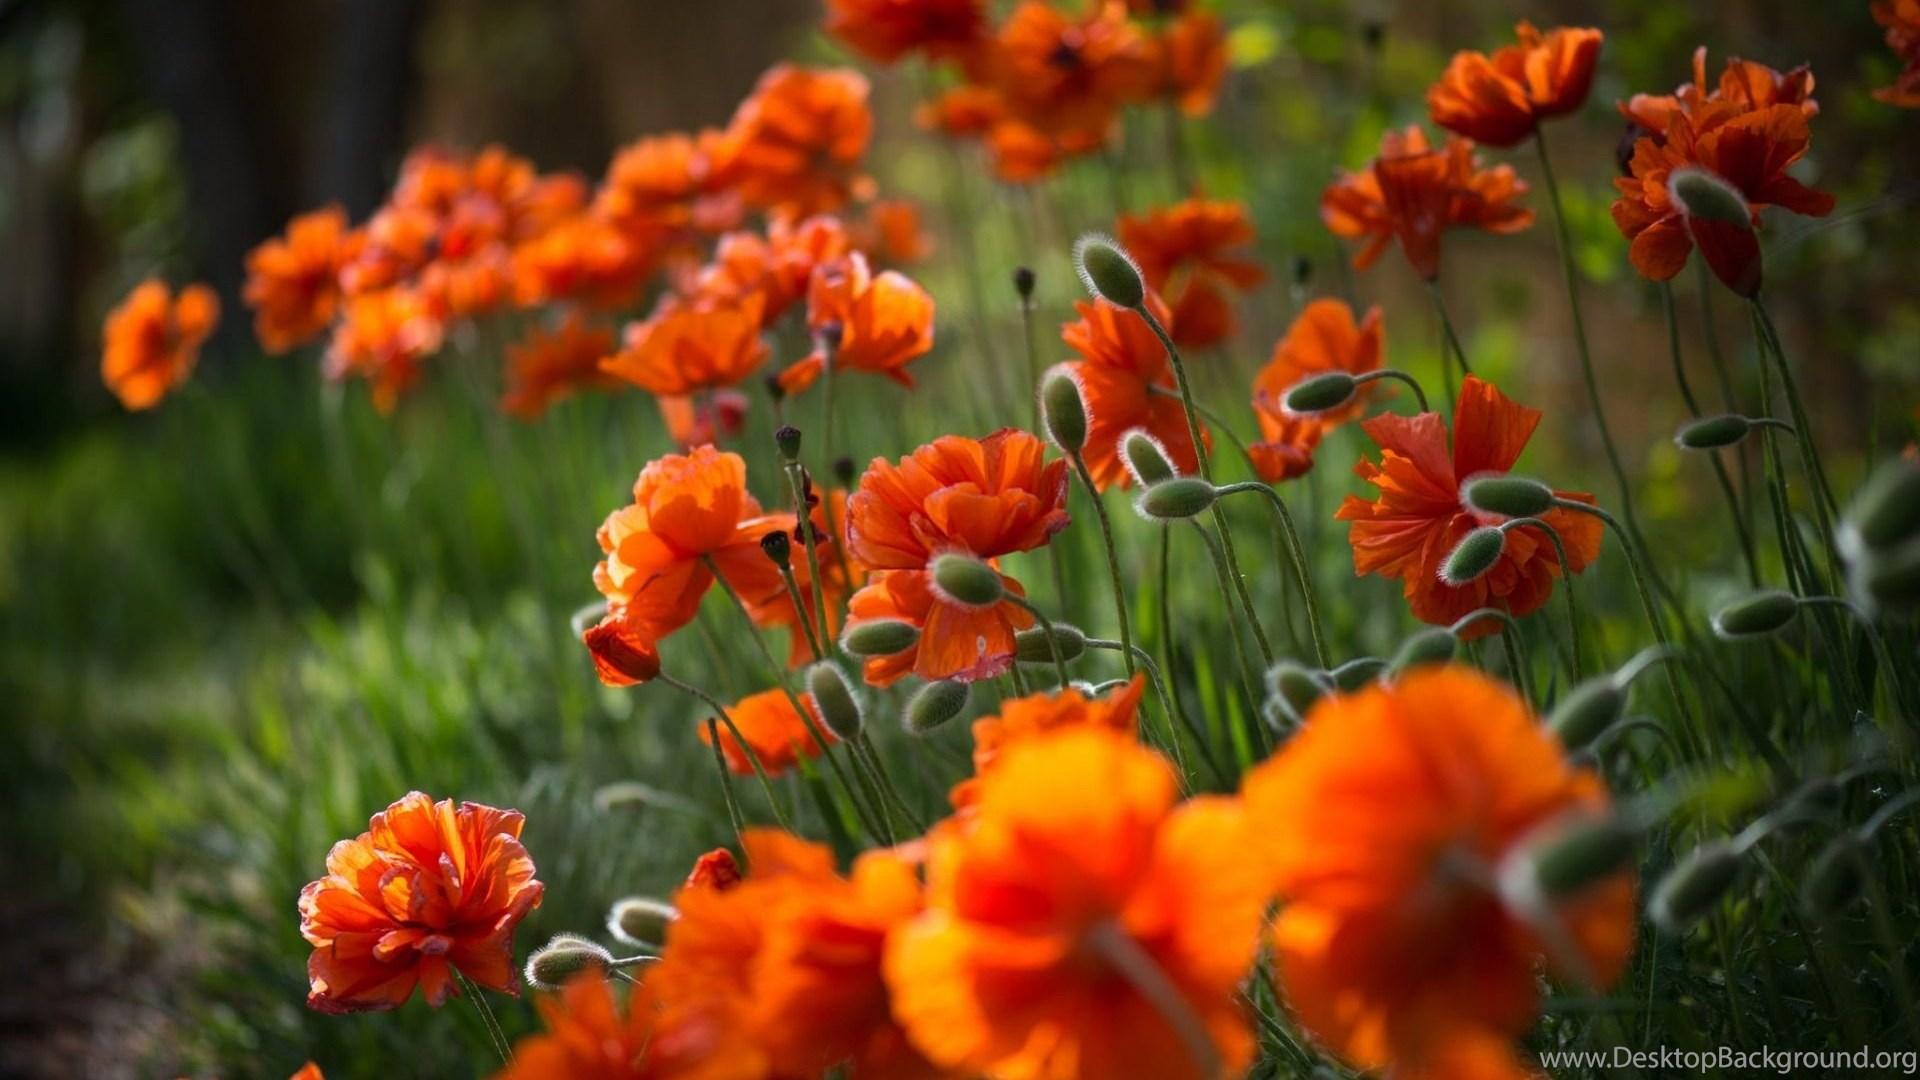 383481 orange flowers wallpapers hd download of beautiful